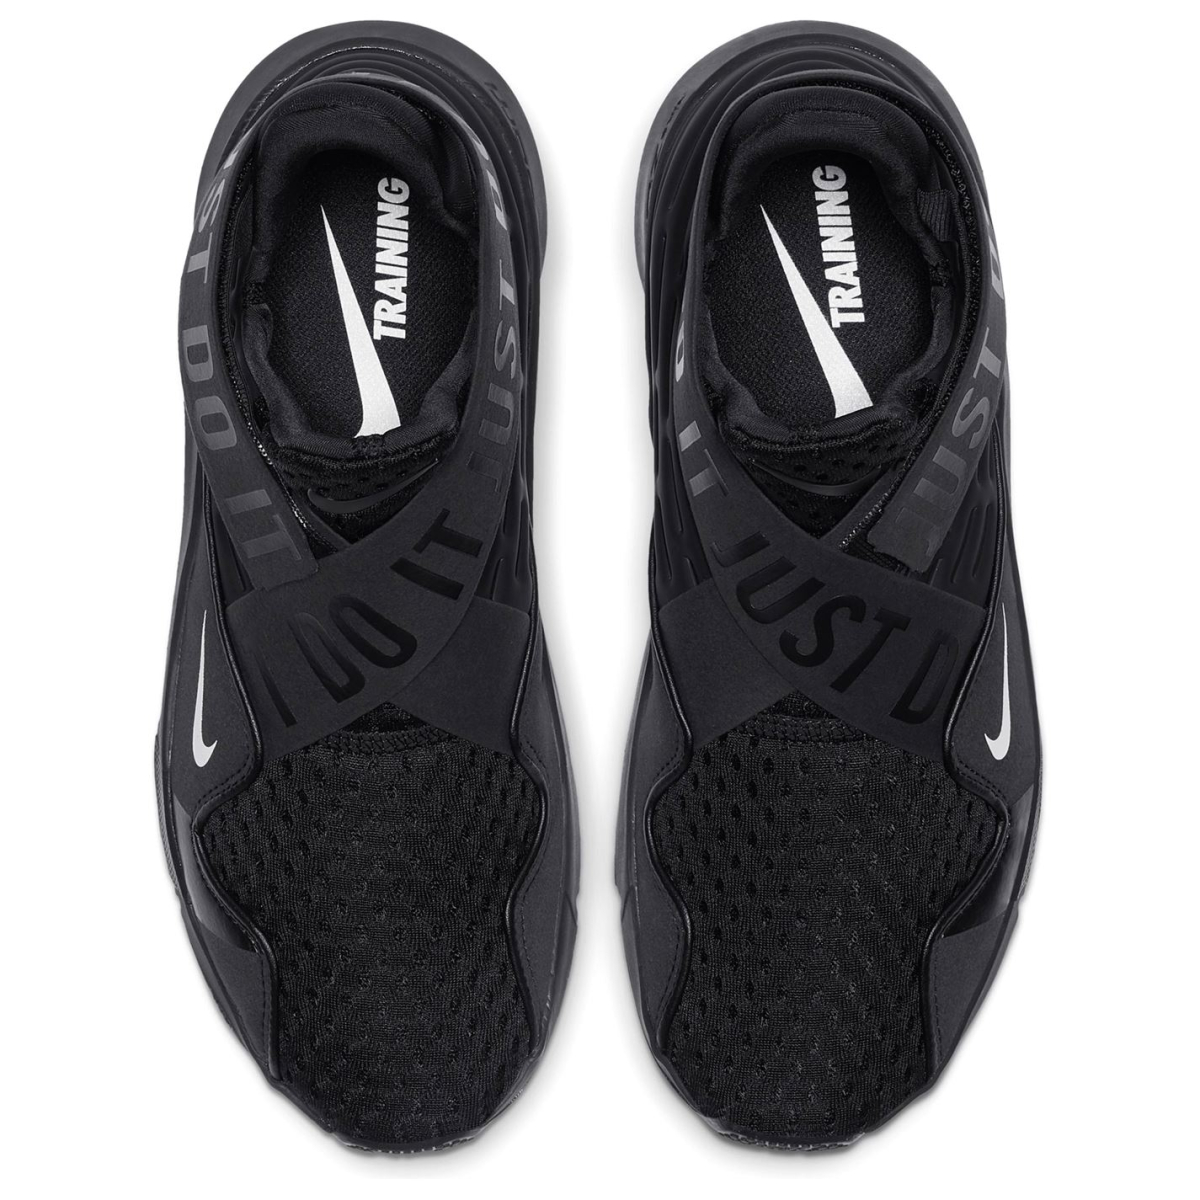 Nike Zoom Elevate 2 Turnschuhe Damen Sneaker Sportschuhe Laufschuhe 3054